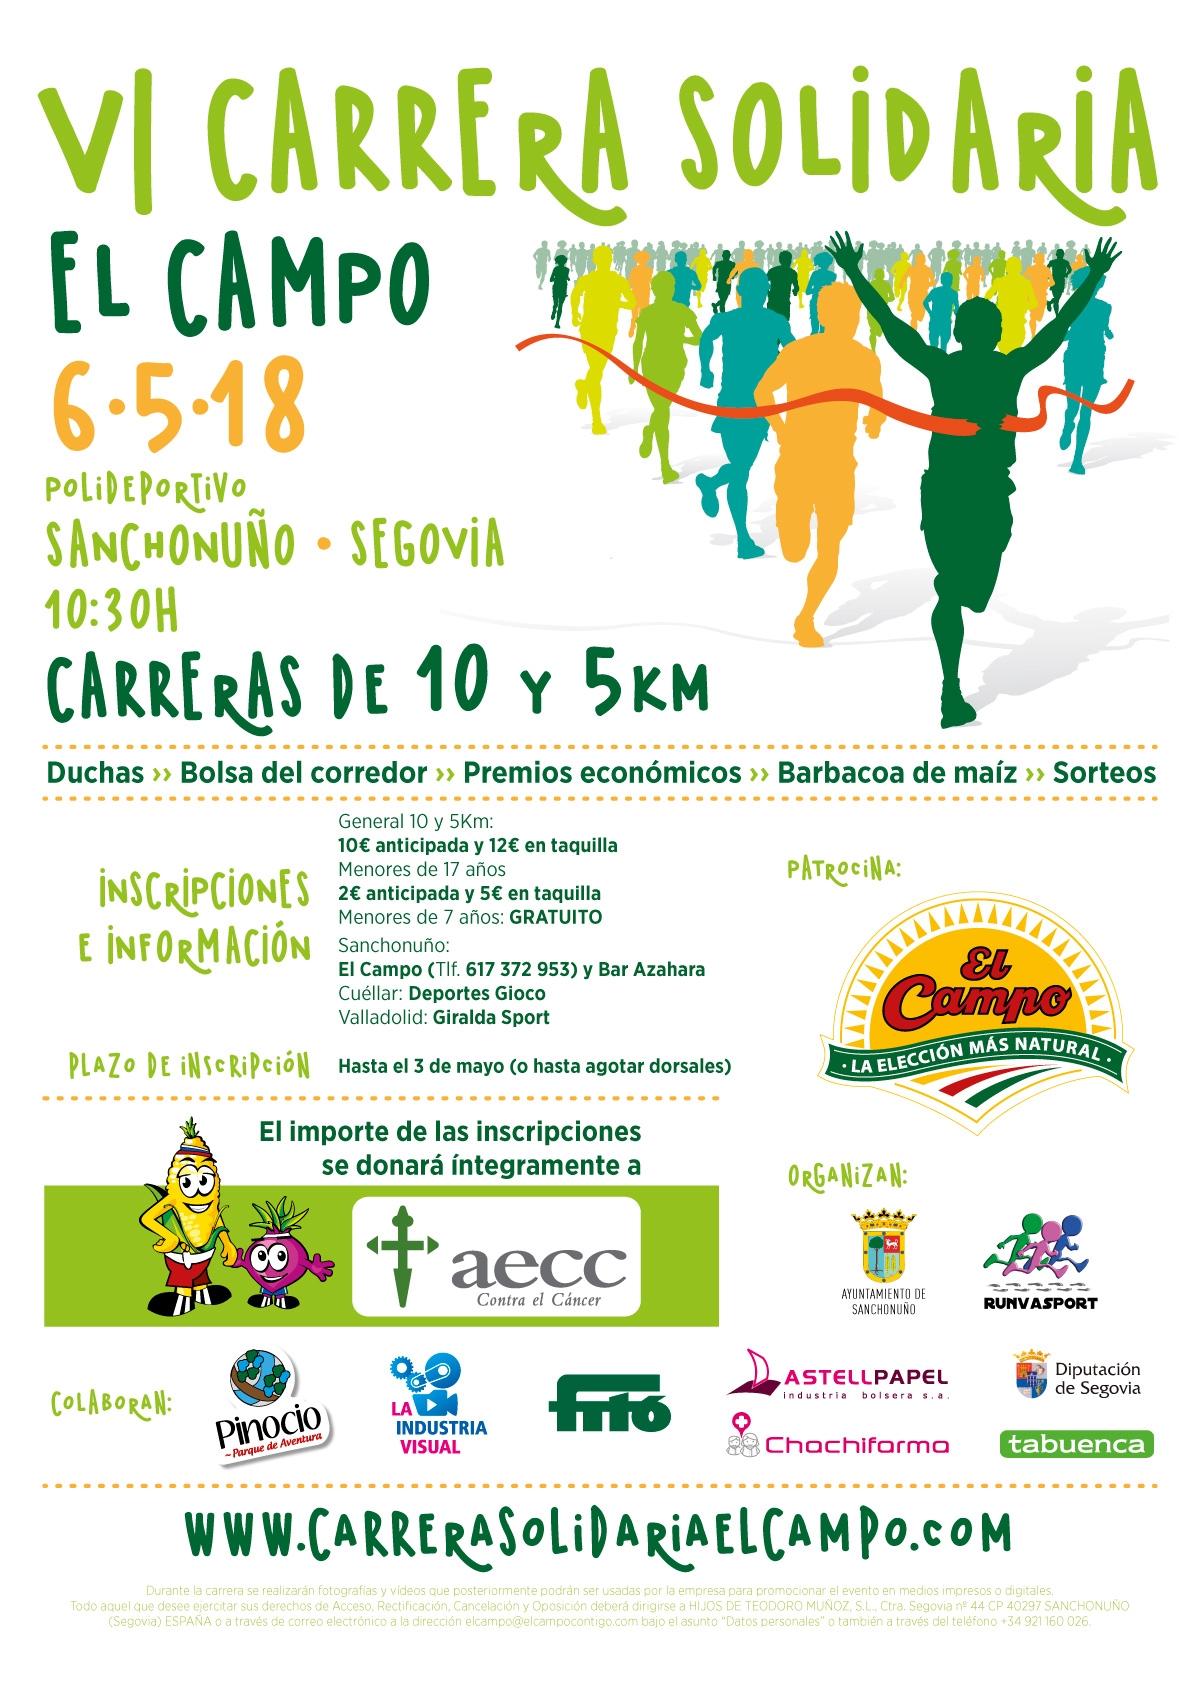 6ª CARRERA SOLIDARIA EL CAMPO